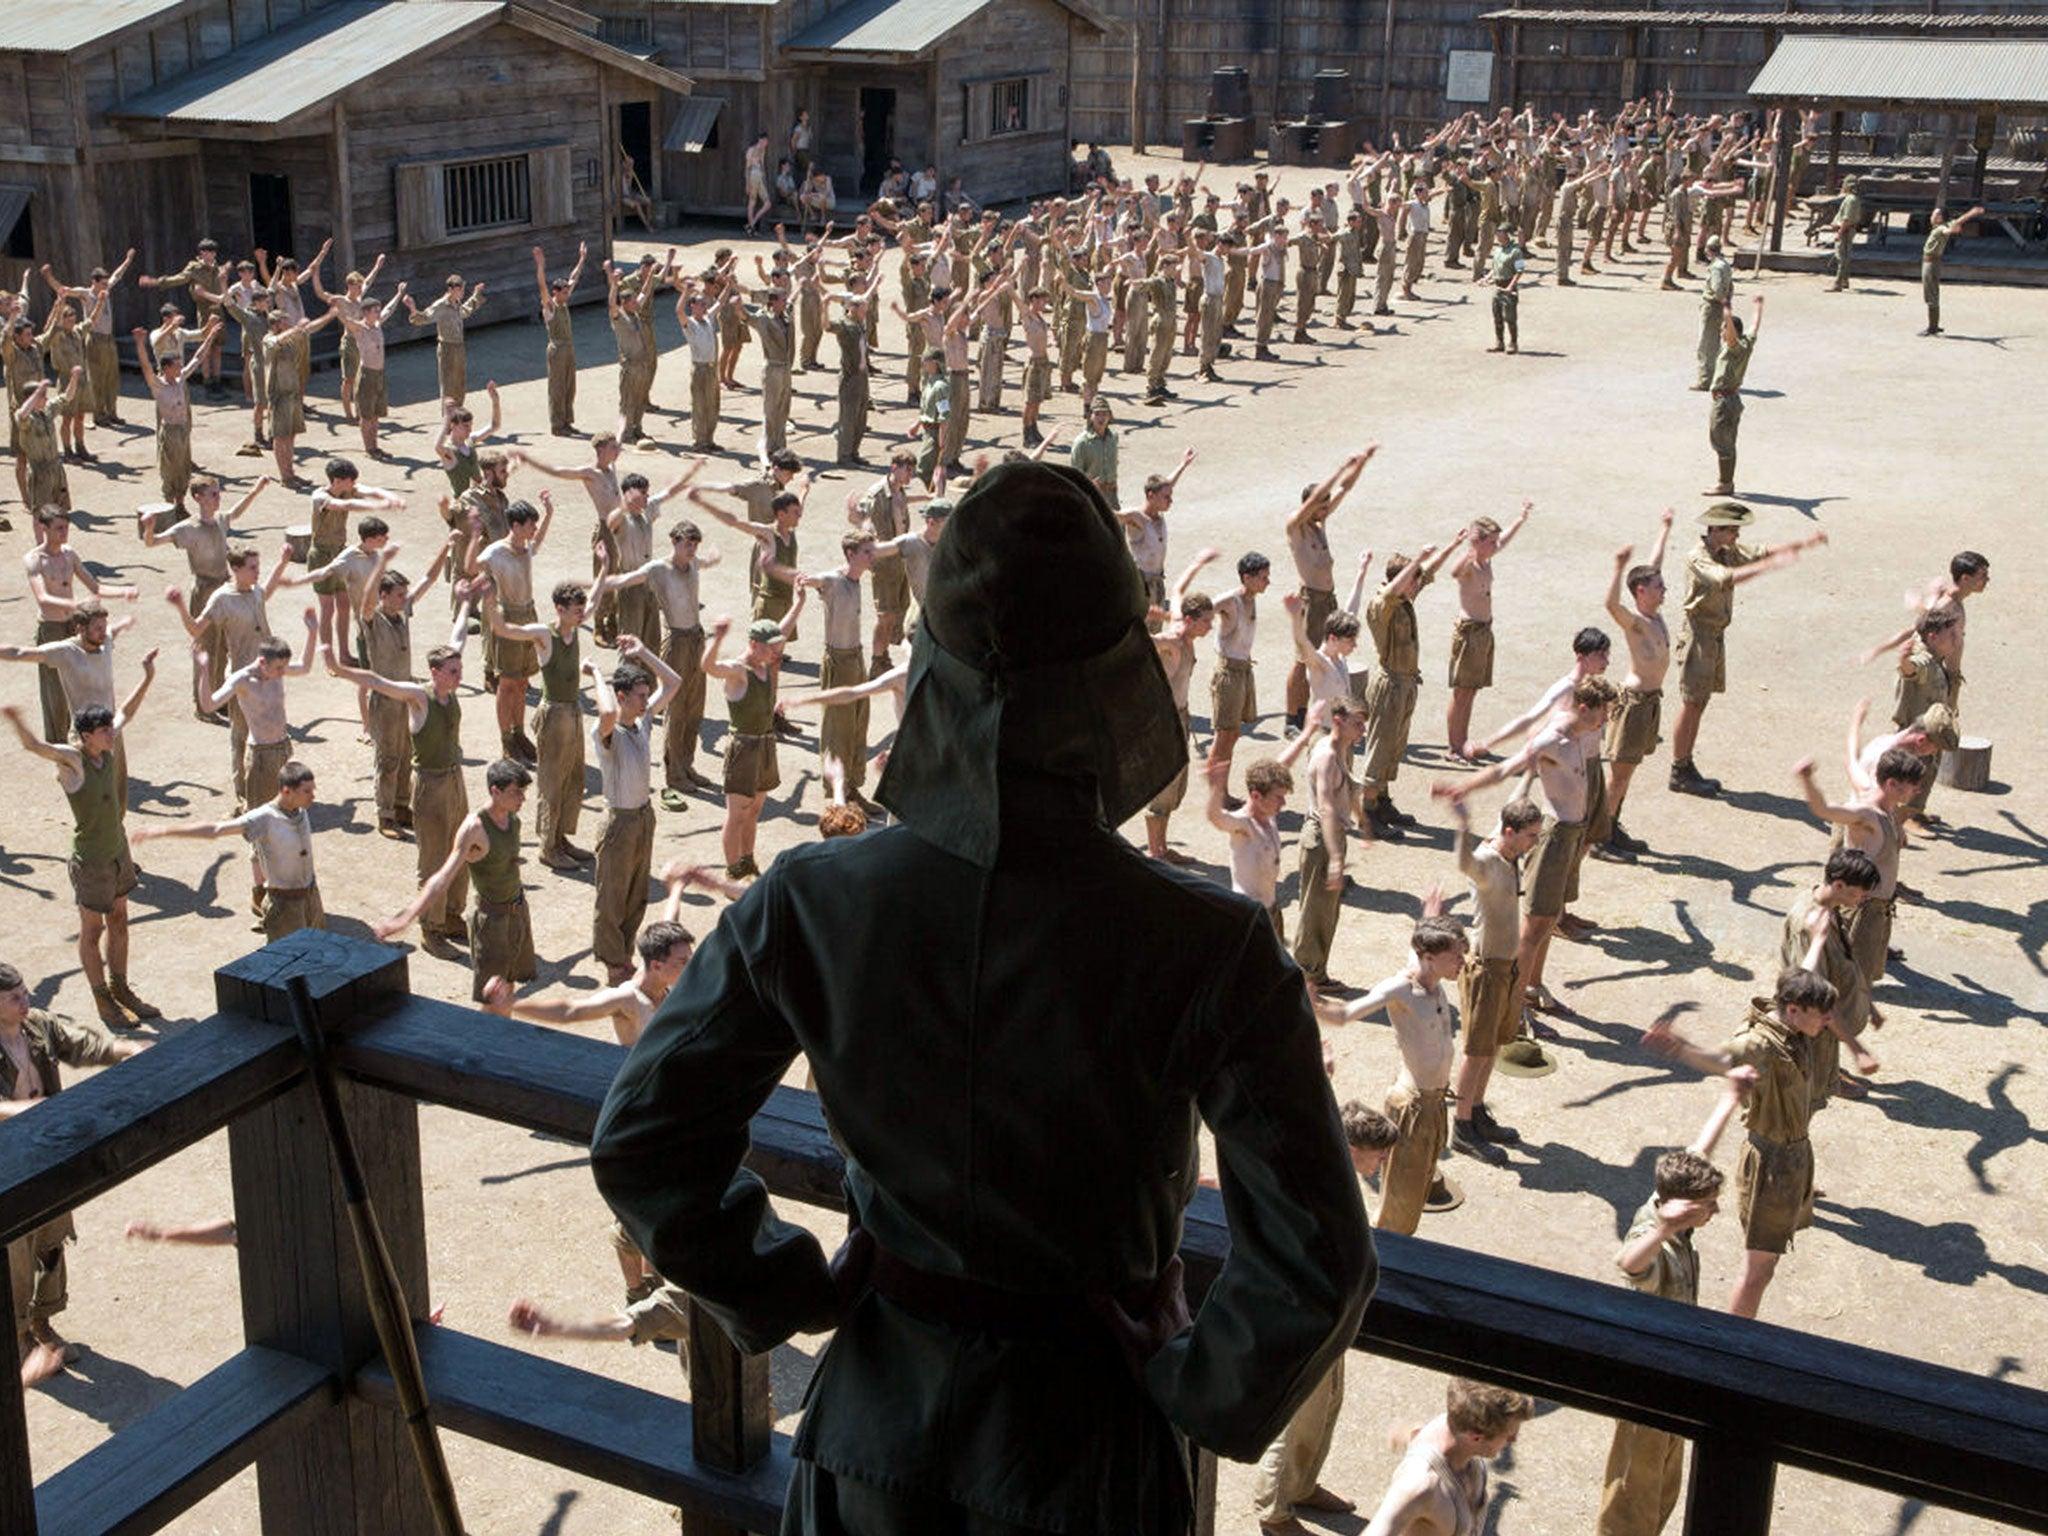 American Sniper original ending showing death of Chris Kyle